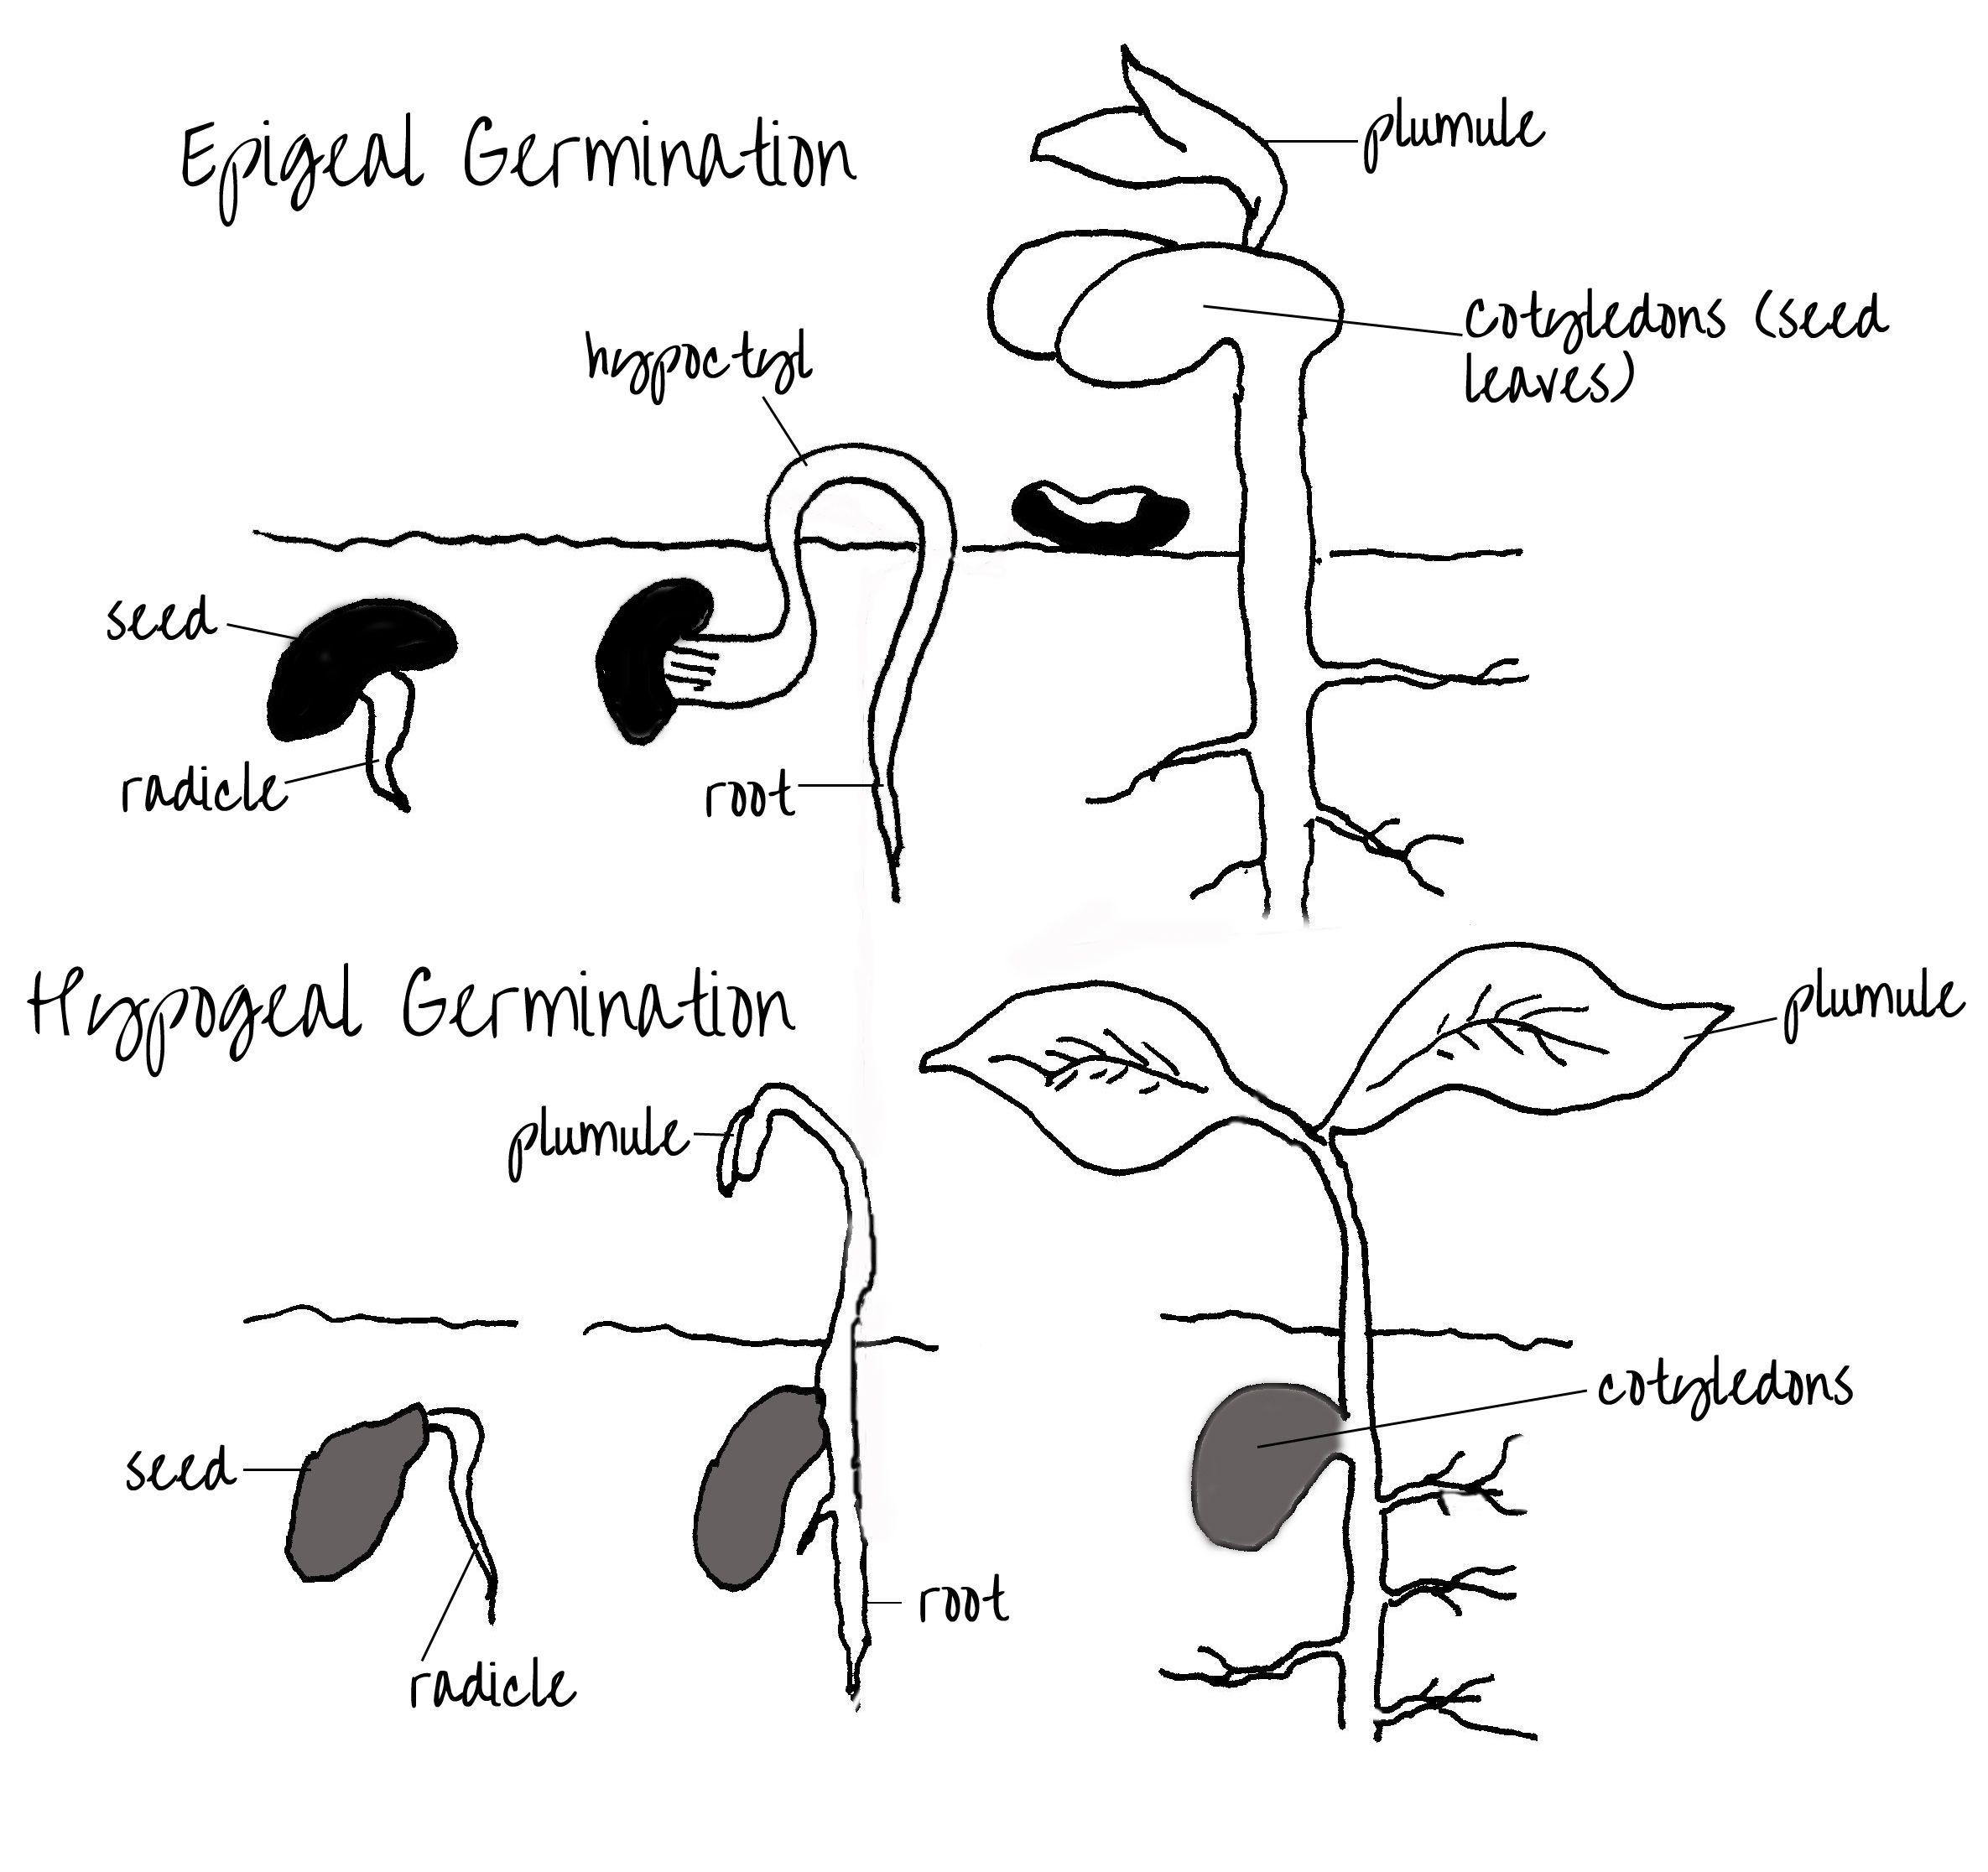 epigeal hypogeal germination of seeds [ 2370 x 2232 Pixel ]